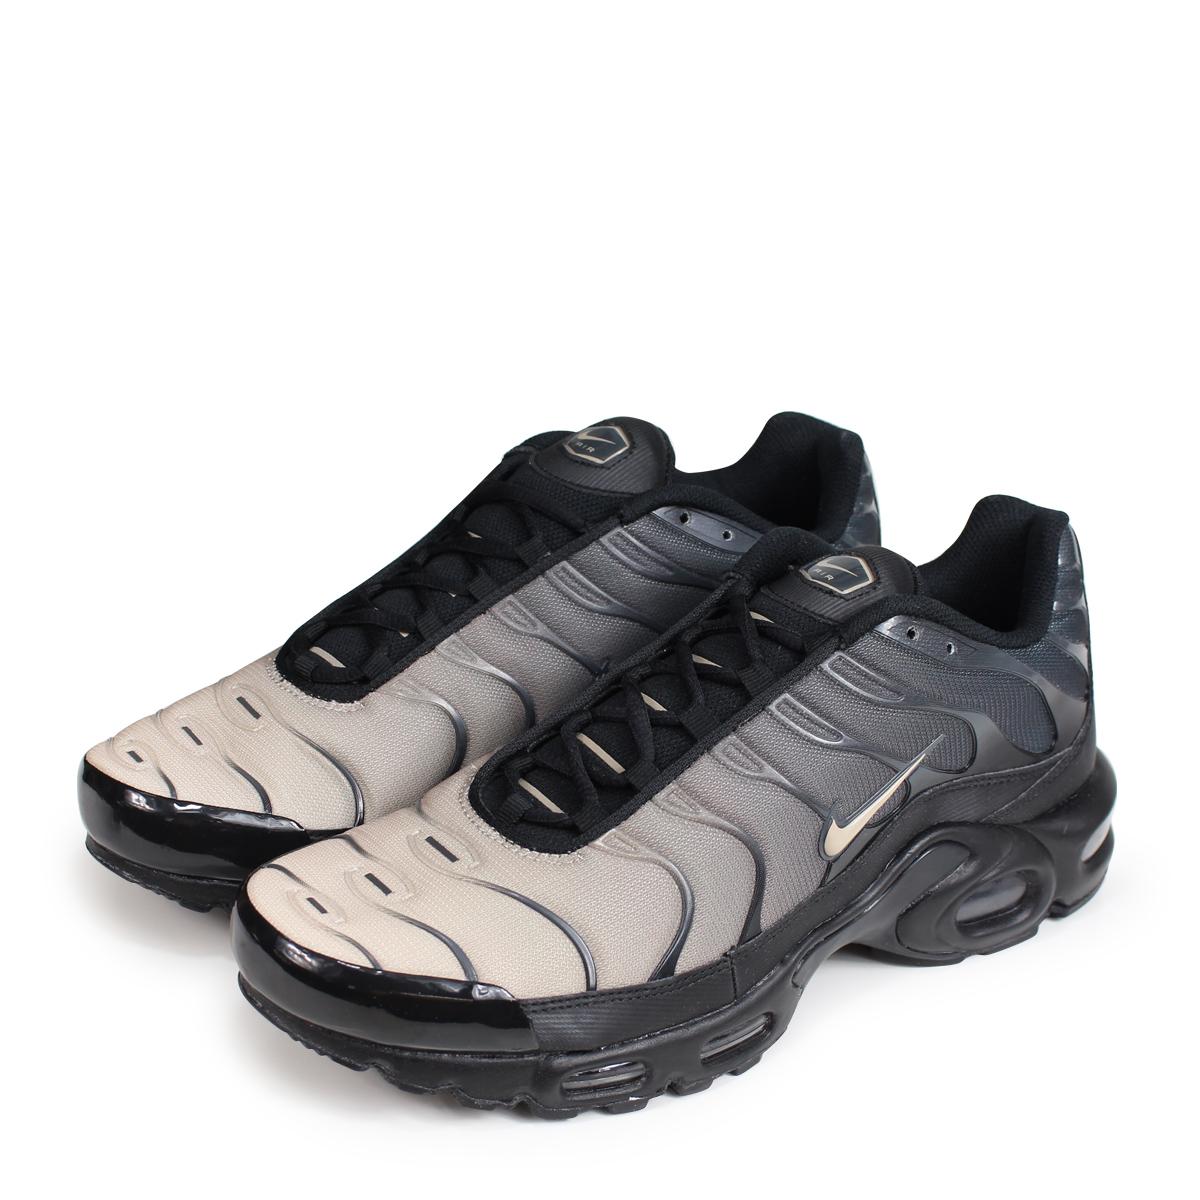 b77a2e68ec NIKE AIR MAX PLUS Kie Ney AMAX plus sneakers men 852,630-026 black [load ...